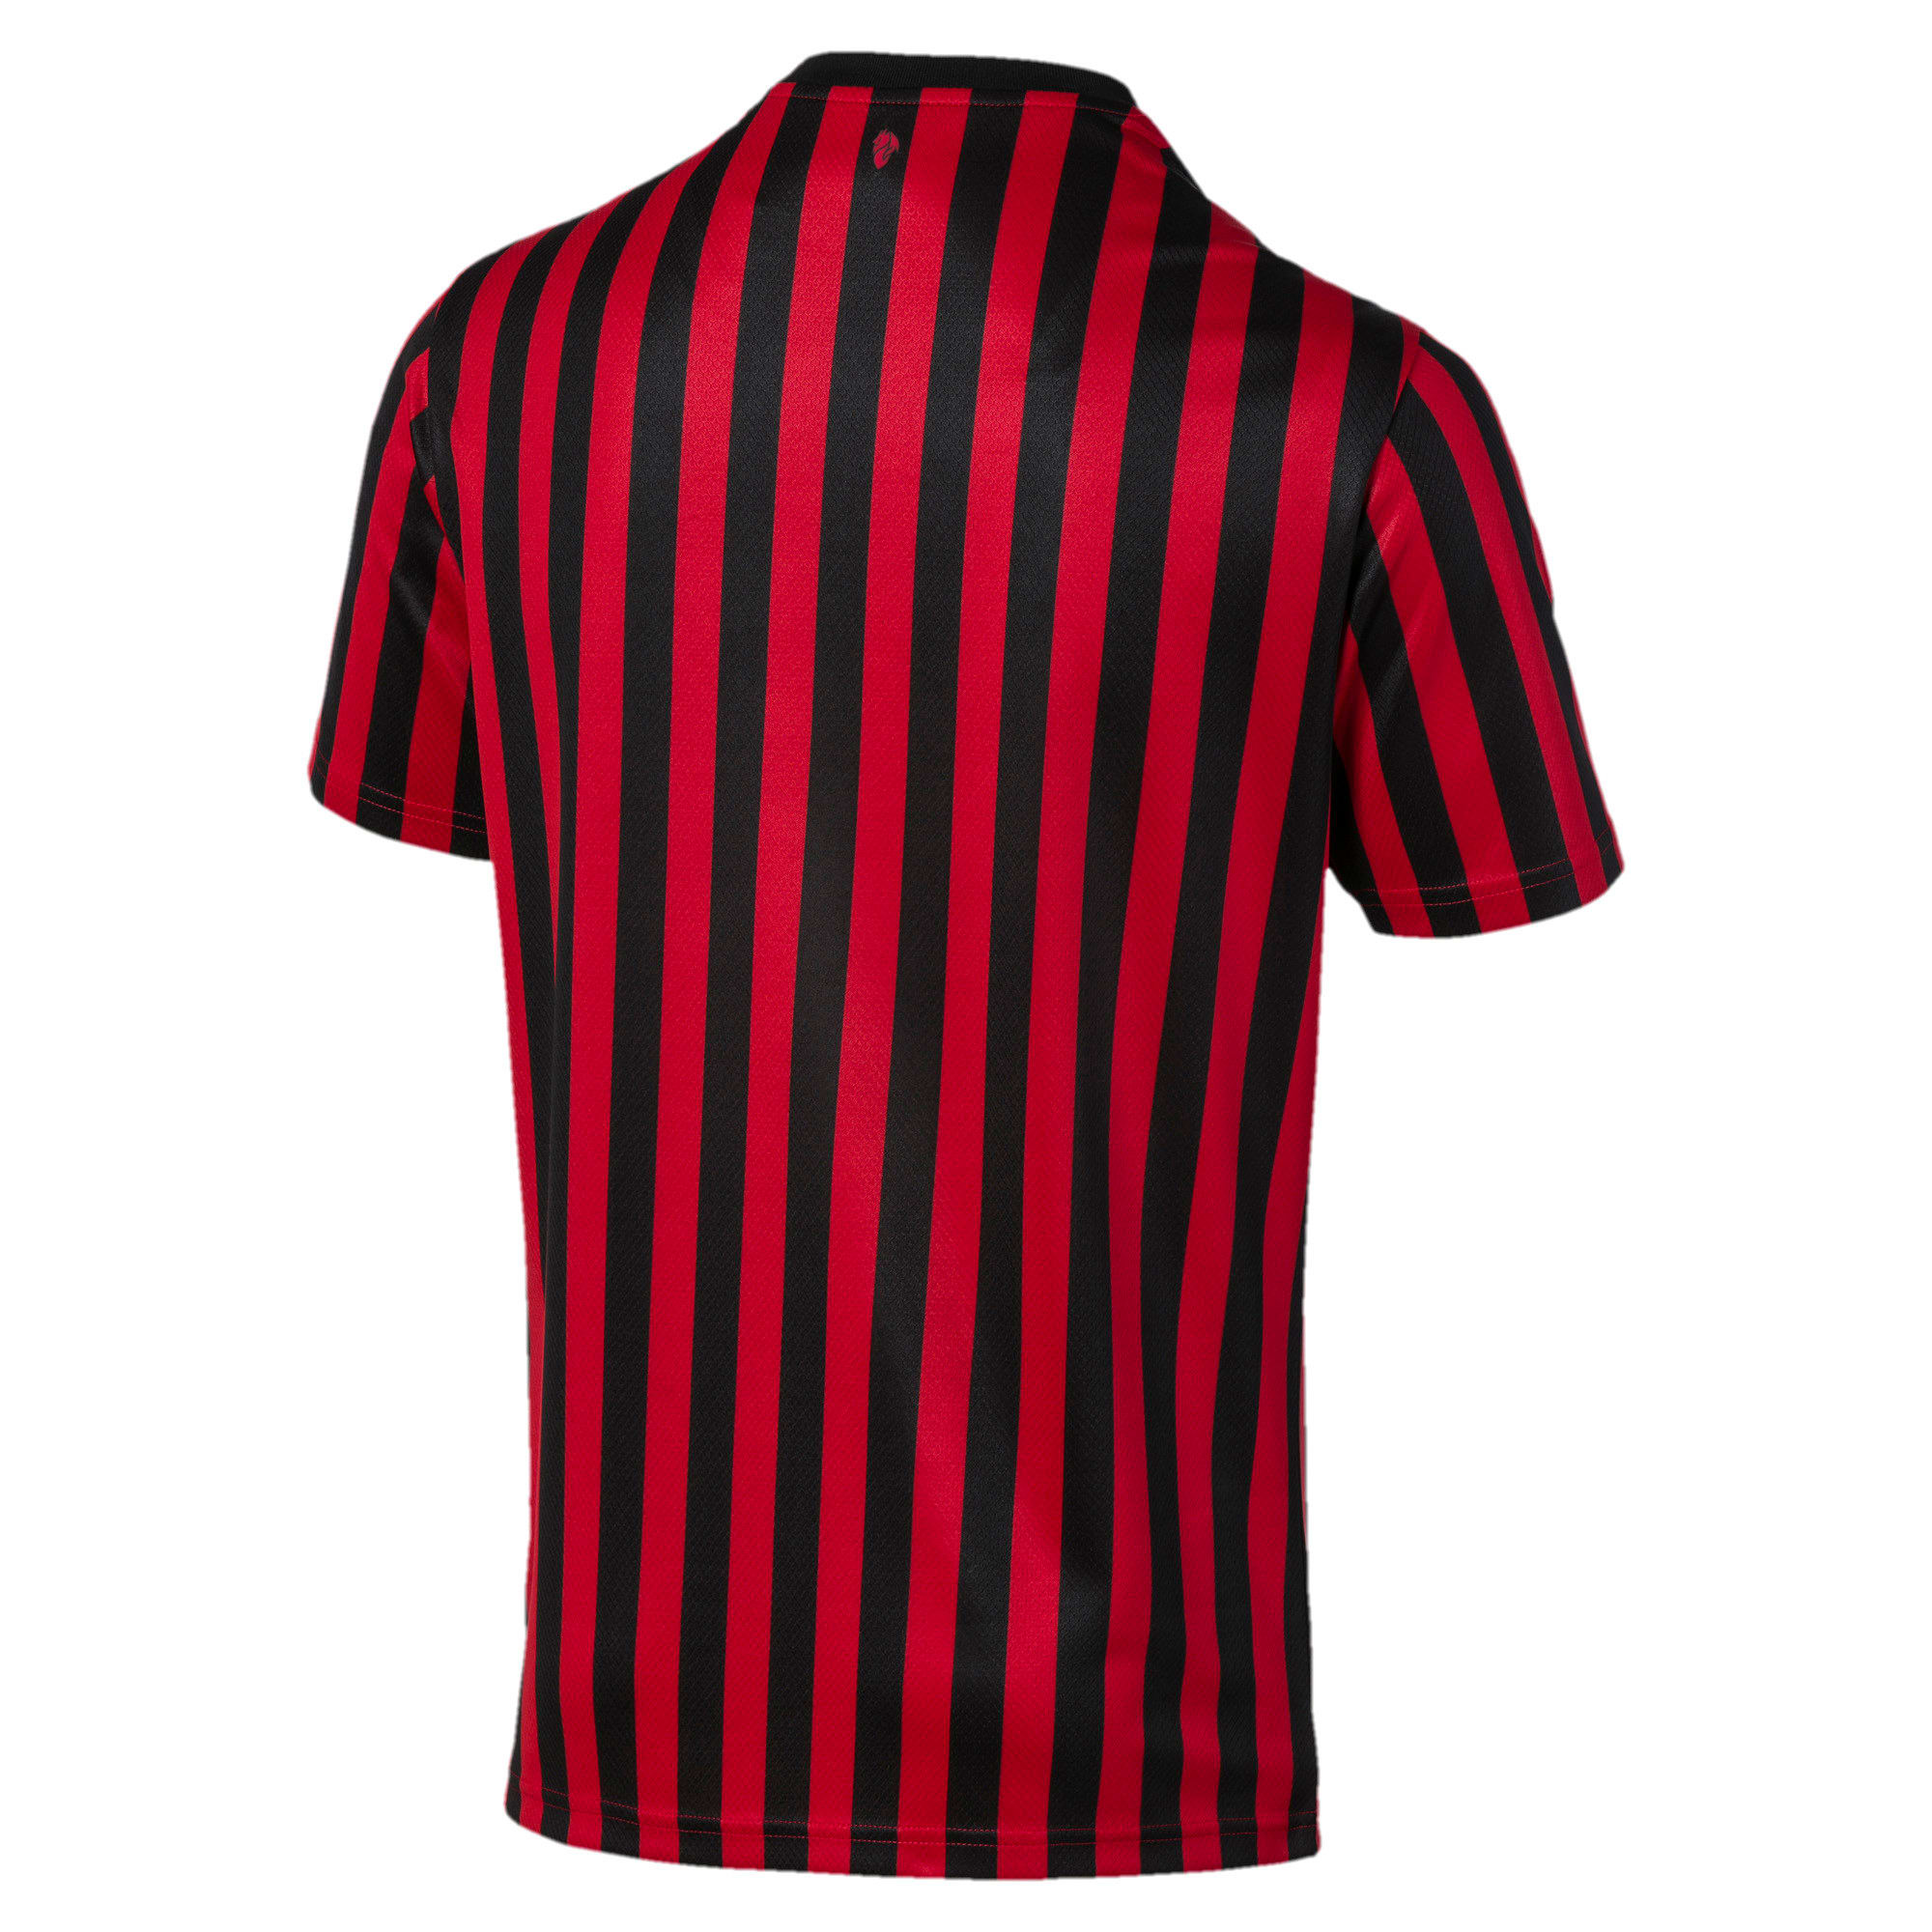 Thumbnail 2 of AC Milan Home Authentic Short Sleeve Men's Jersey, Tango Red -Puma Black, medium